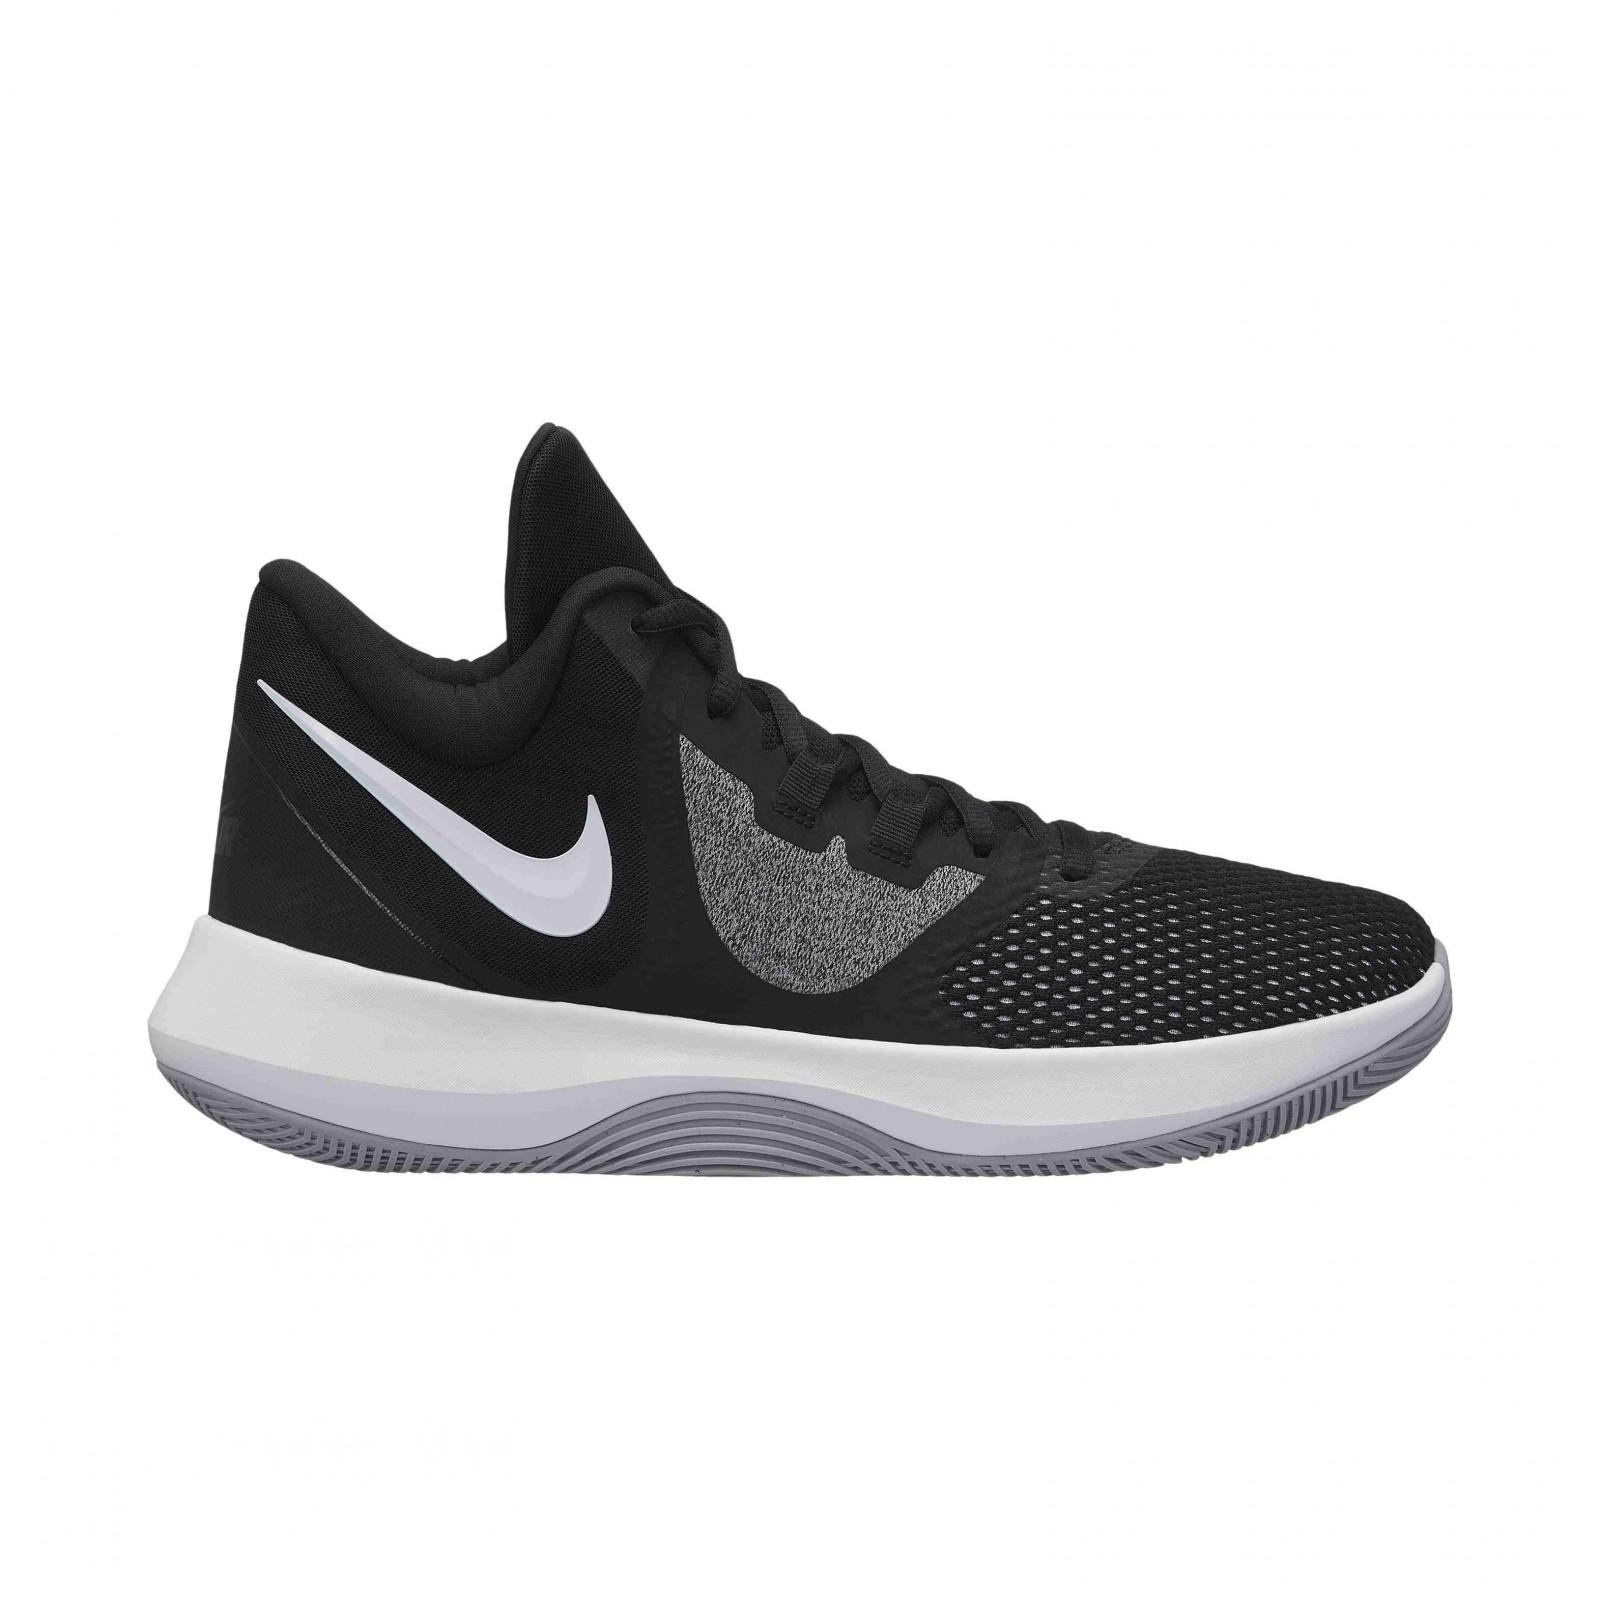 0a7efa20e1b7b Pánské Basketbalové boty Nike AIR PRECISION II   D-Sport